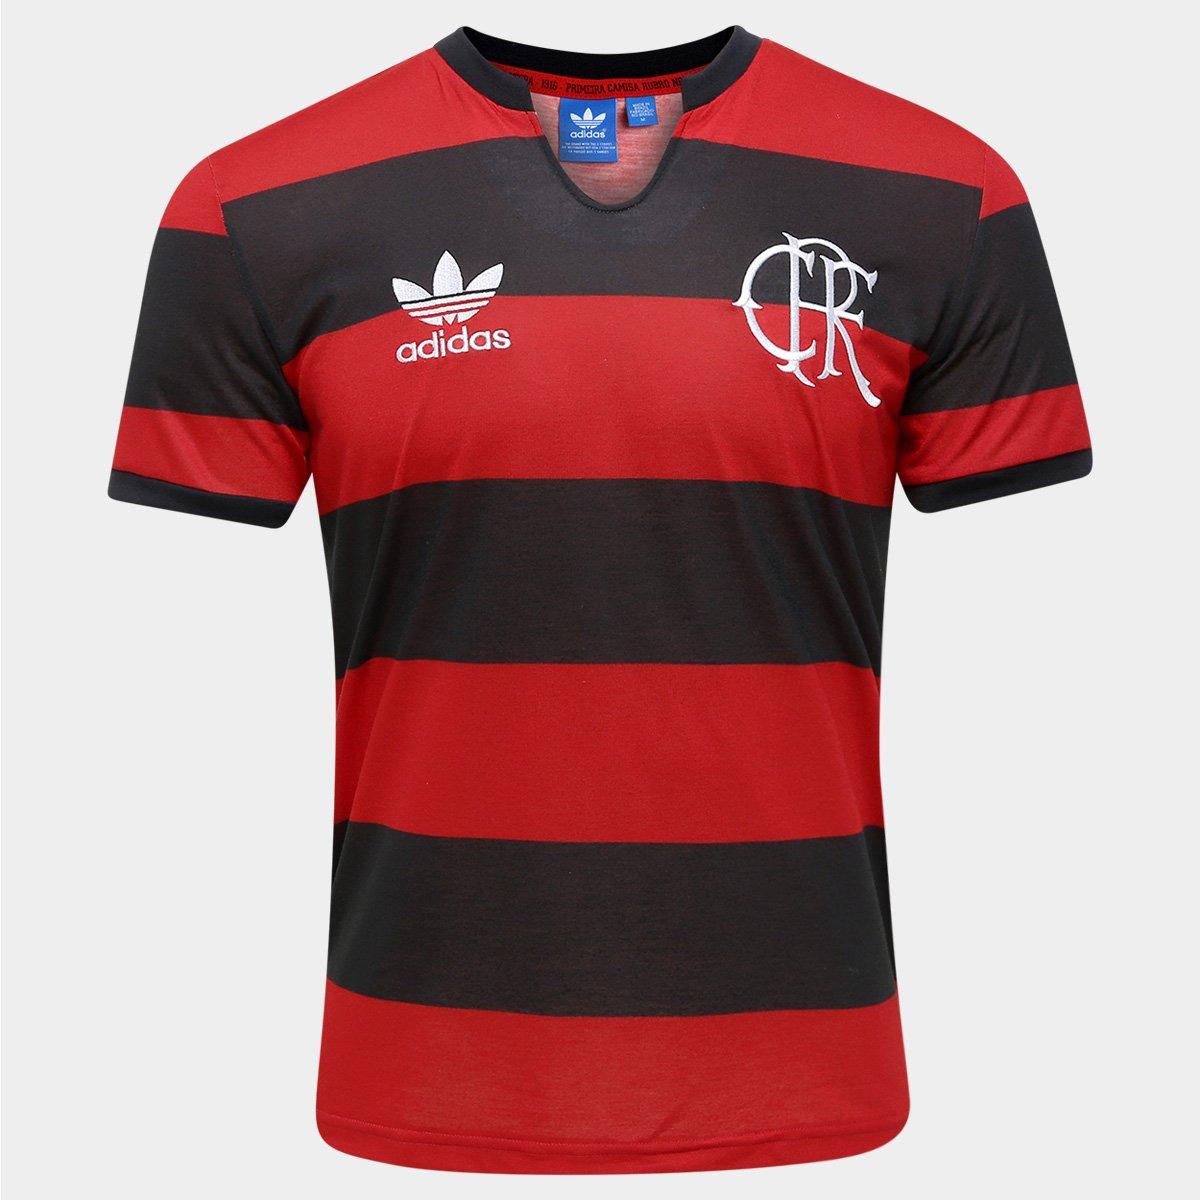 Camisa Retrô Flamengo nº 10 Adidas Masculina - Compre Agora  dd1fe3eb8adb0